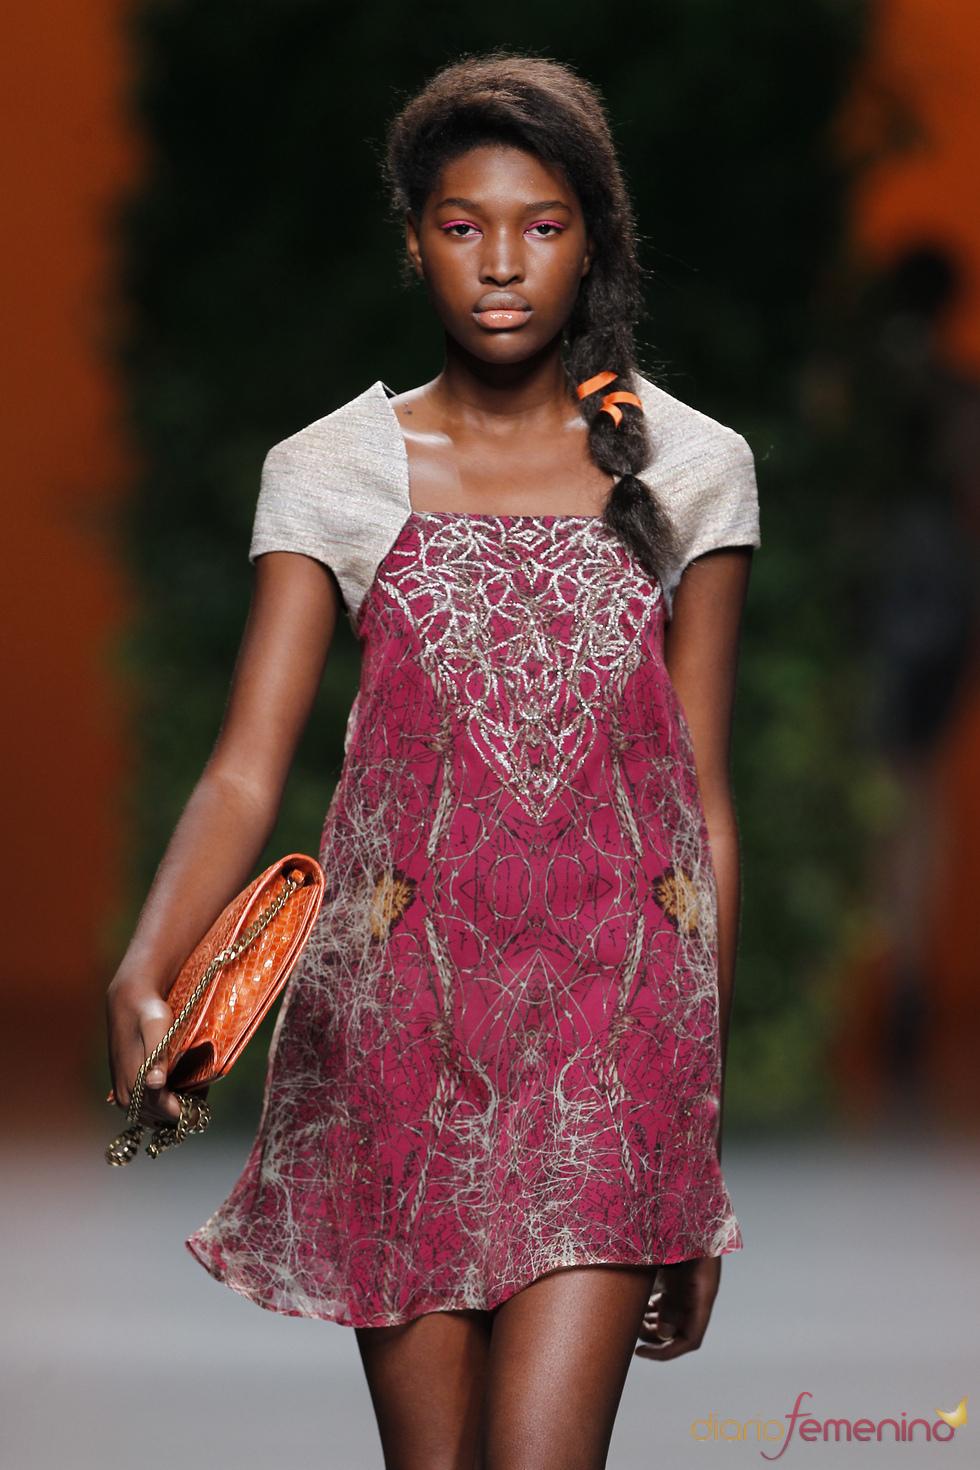 Vestido coqueto de Devota & Lomba para la primavera-verano 2011